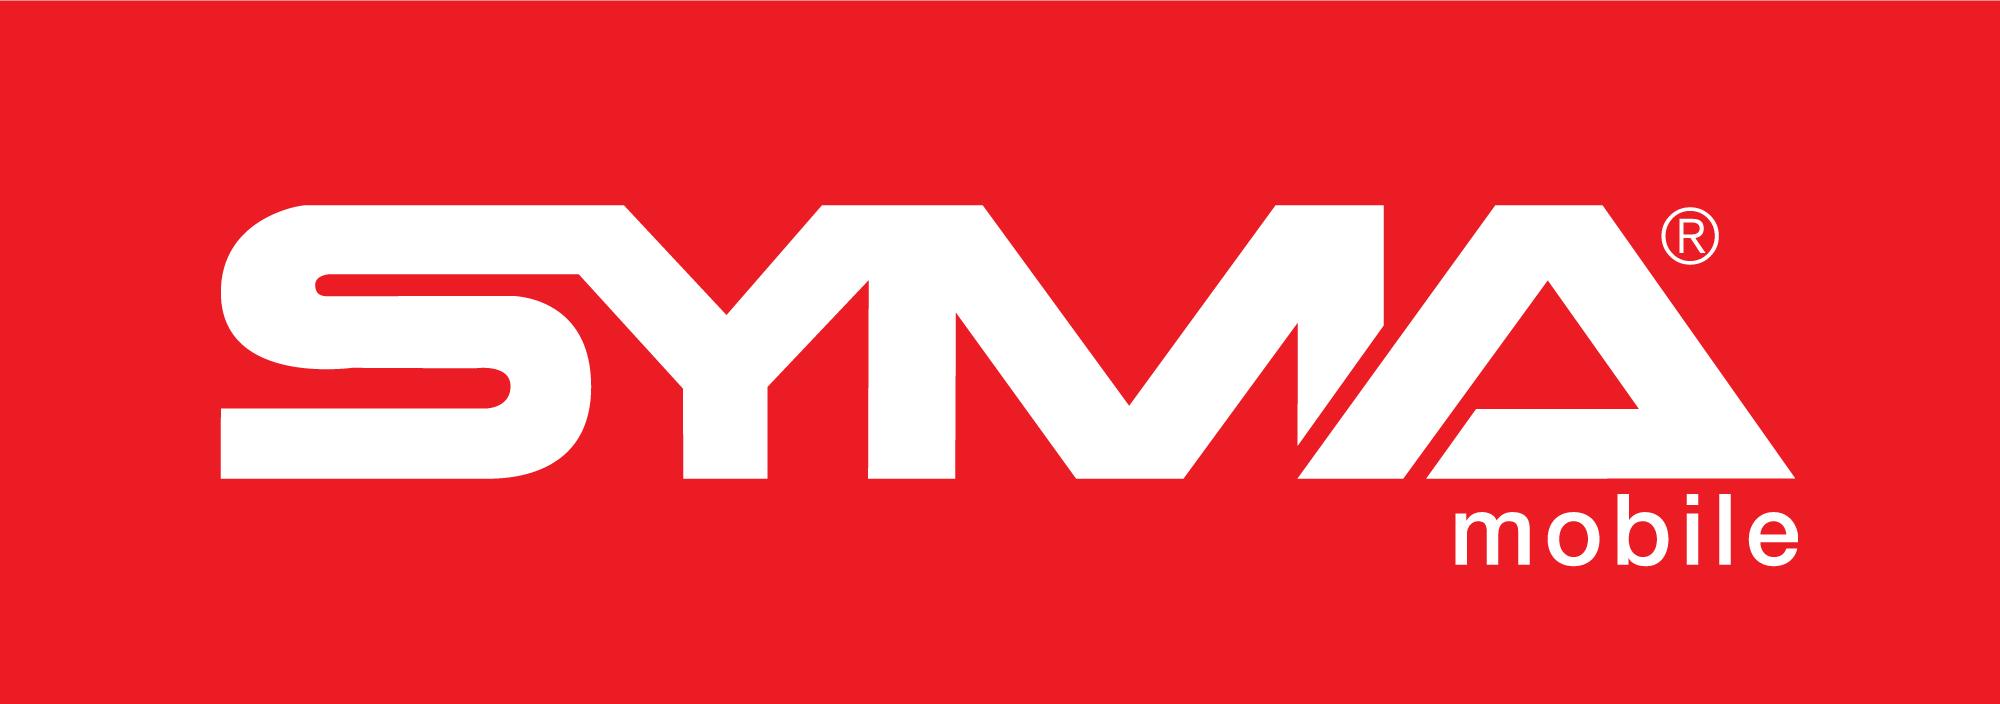 I droni economici Syma